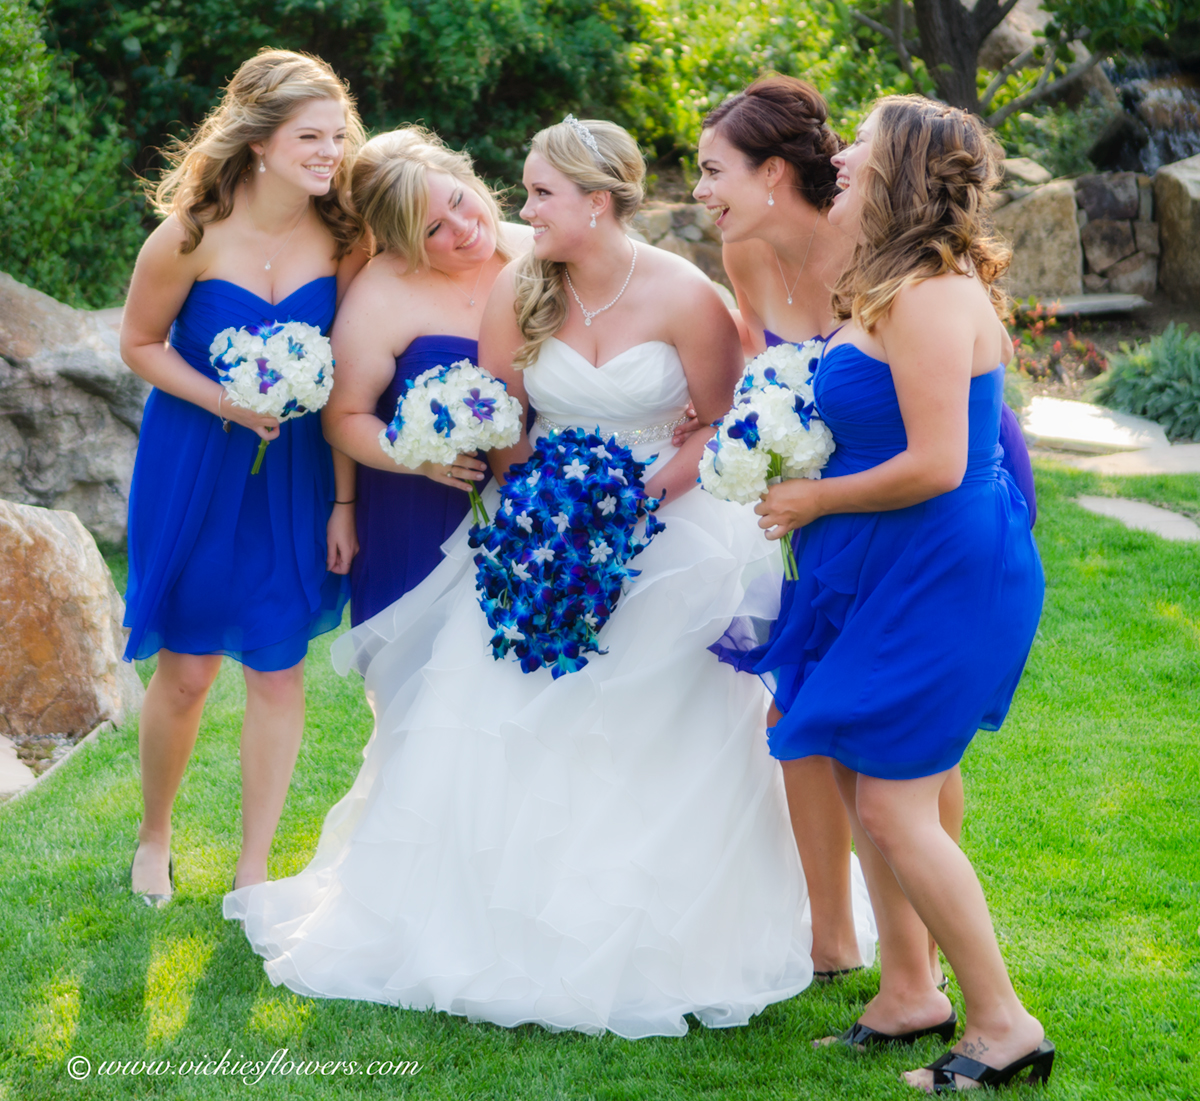 Wedding Bouquets | Vickies Flowers | Brighton Colorado Florist